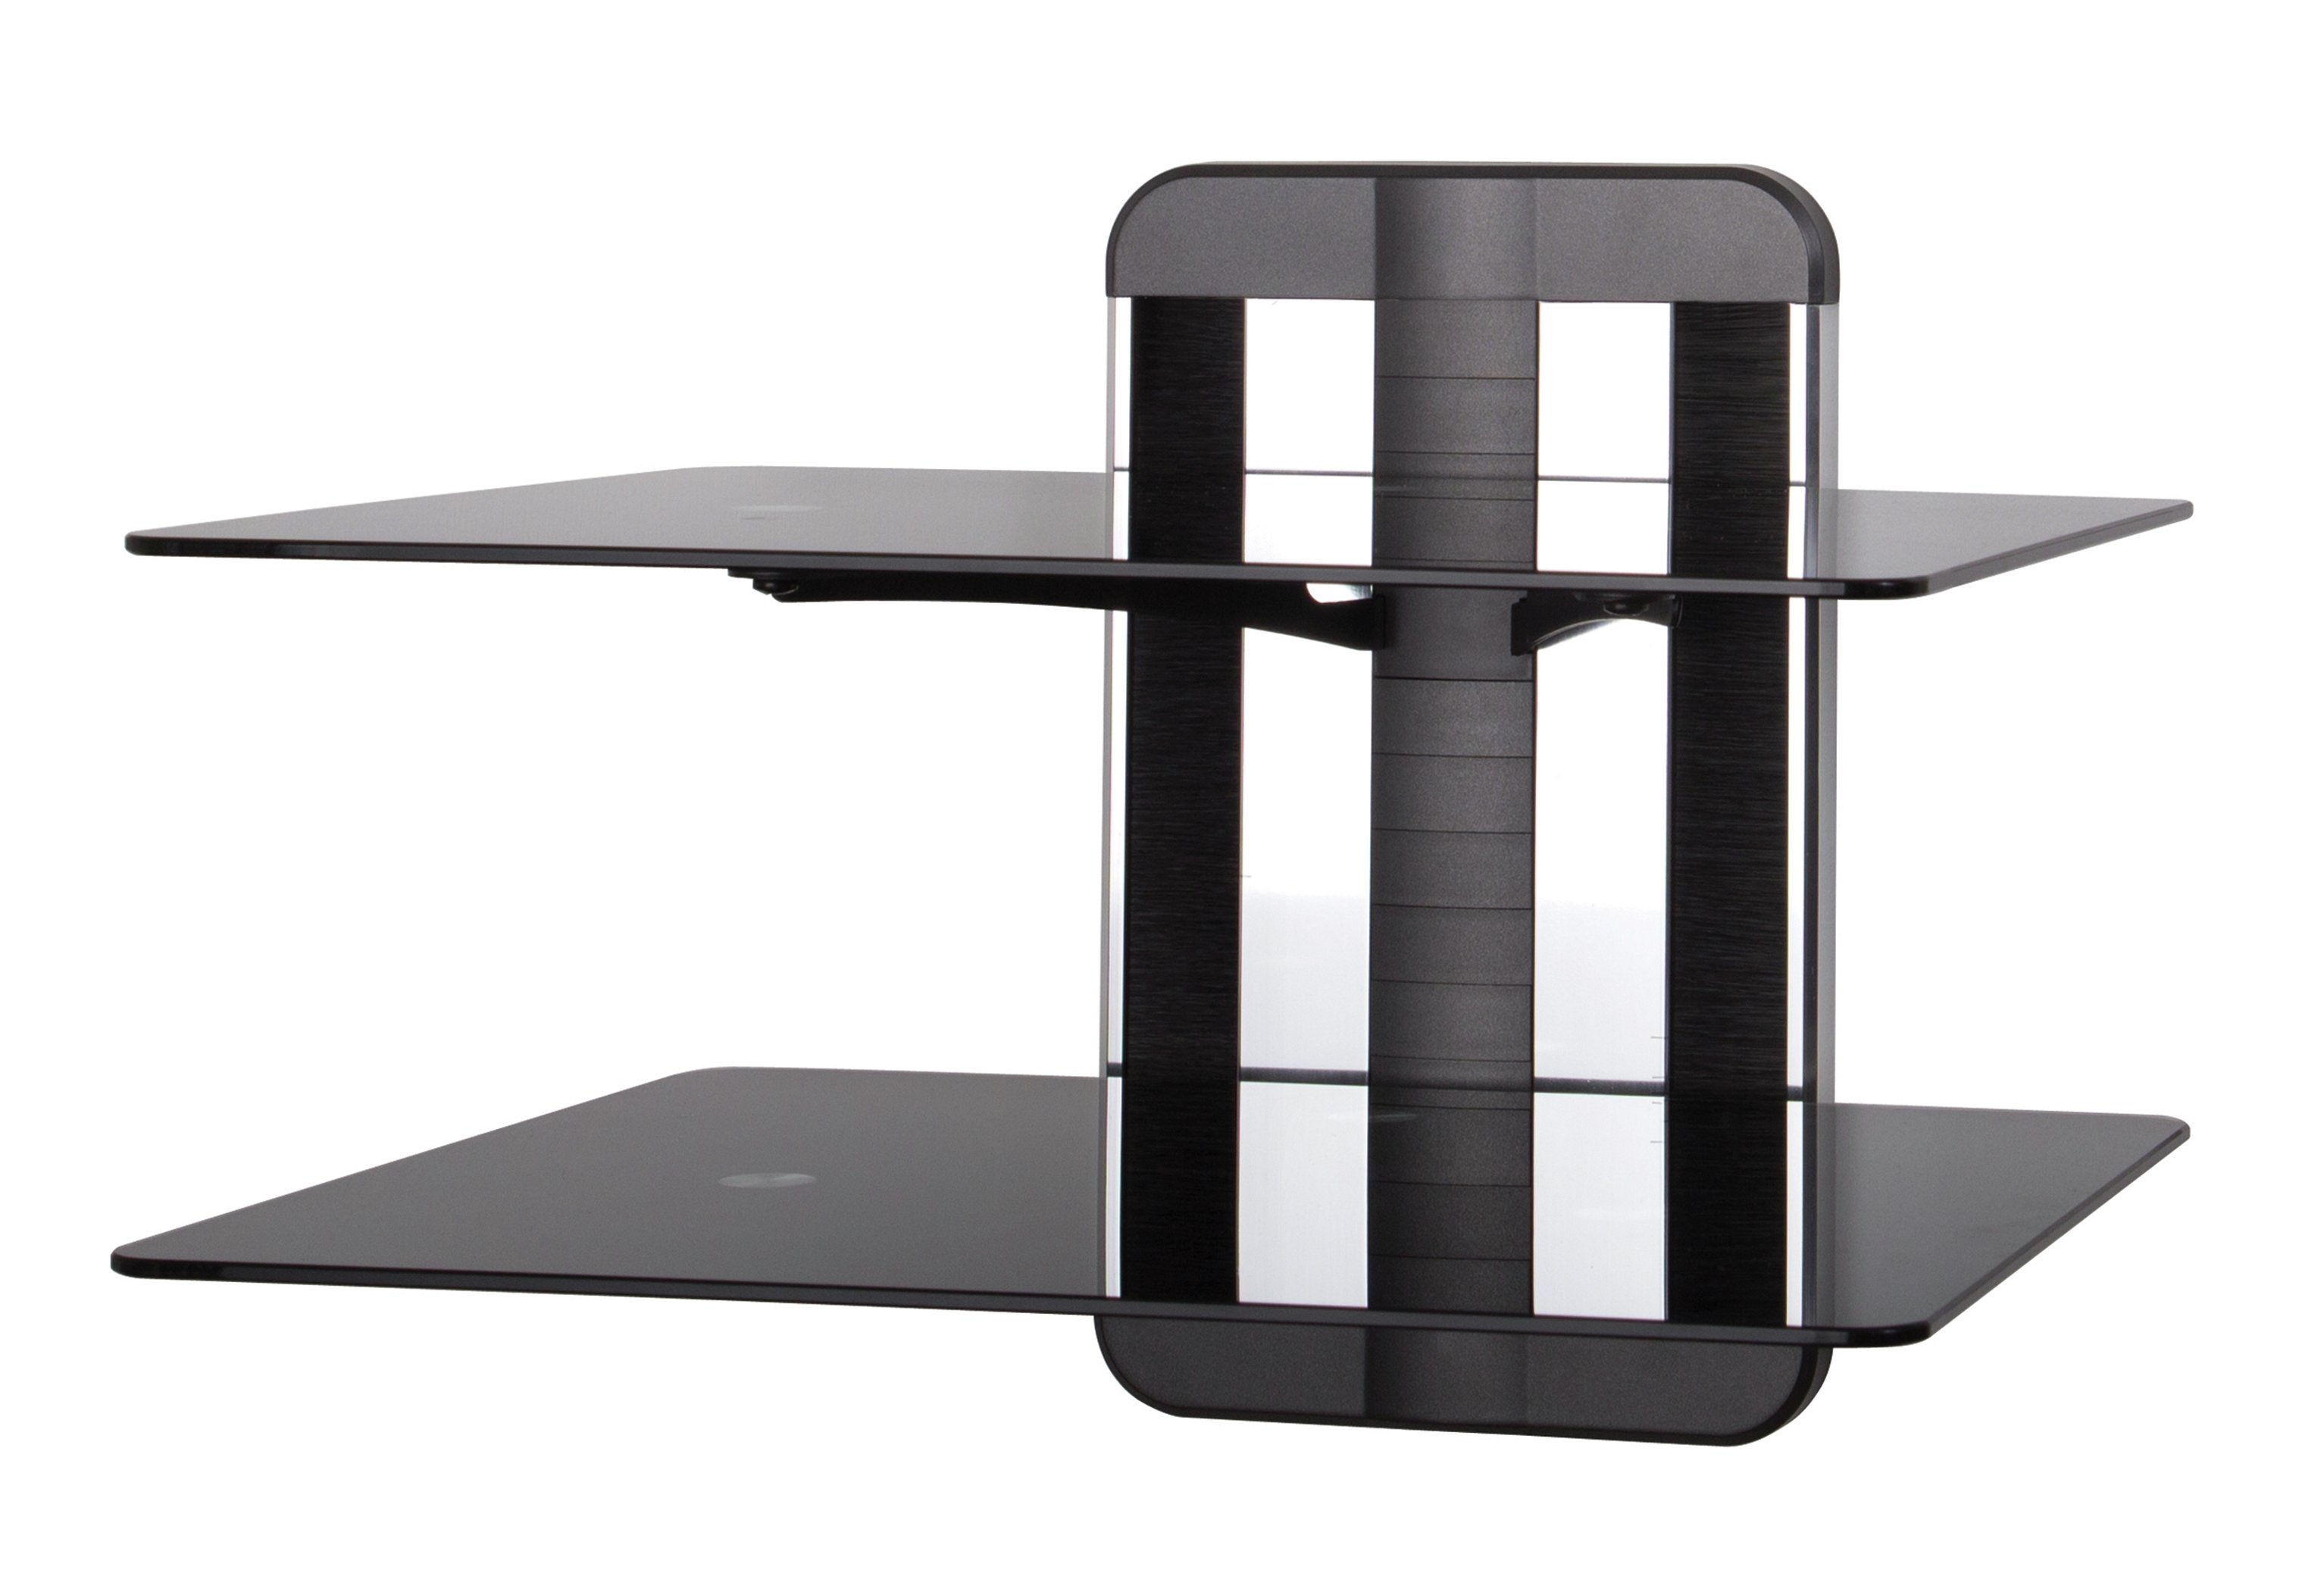 avf unimax tv mount and accessory shelving. Black Bedroom Furniture Sets. Home Design Ideas